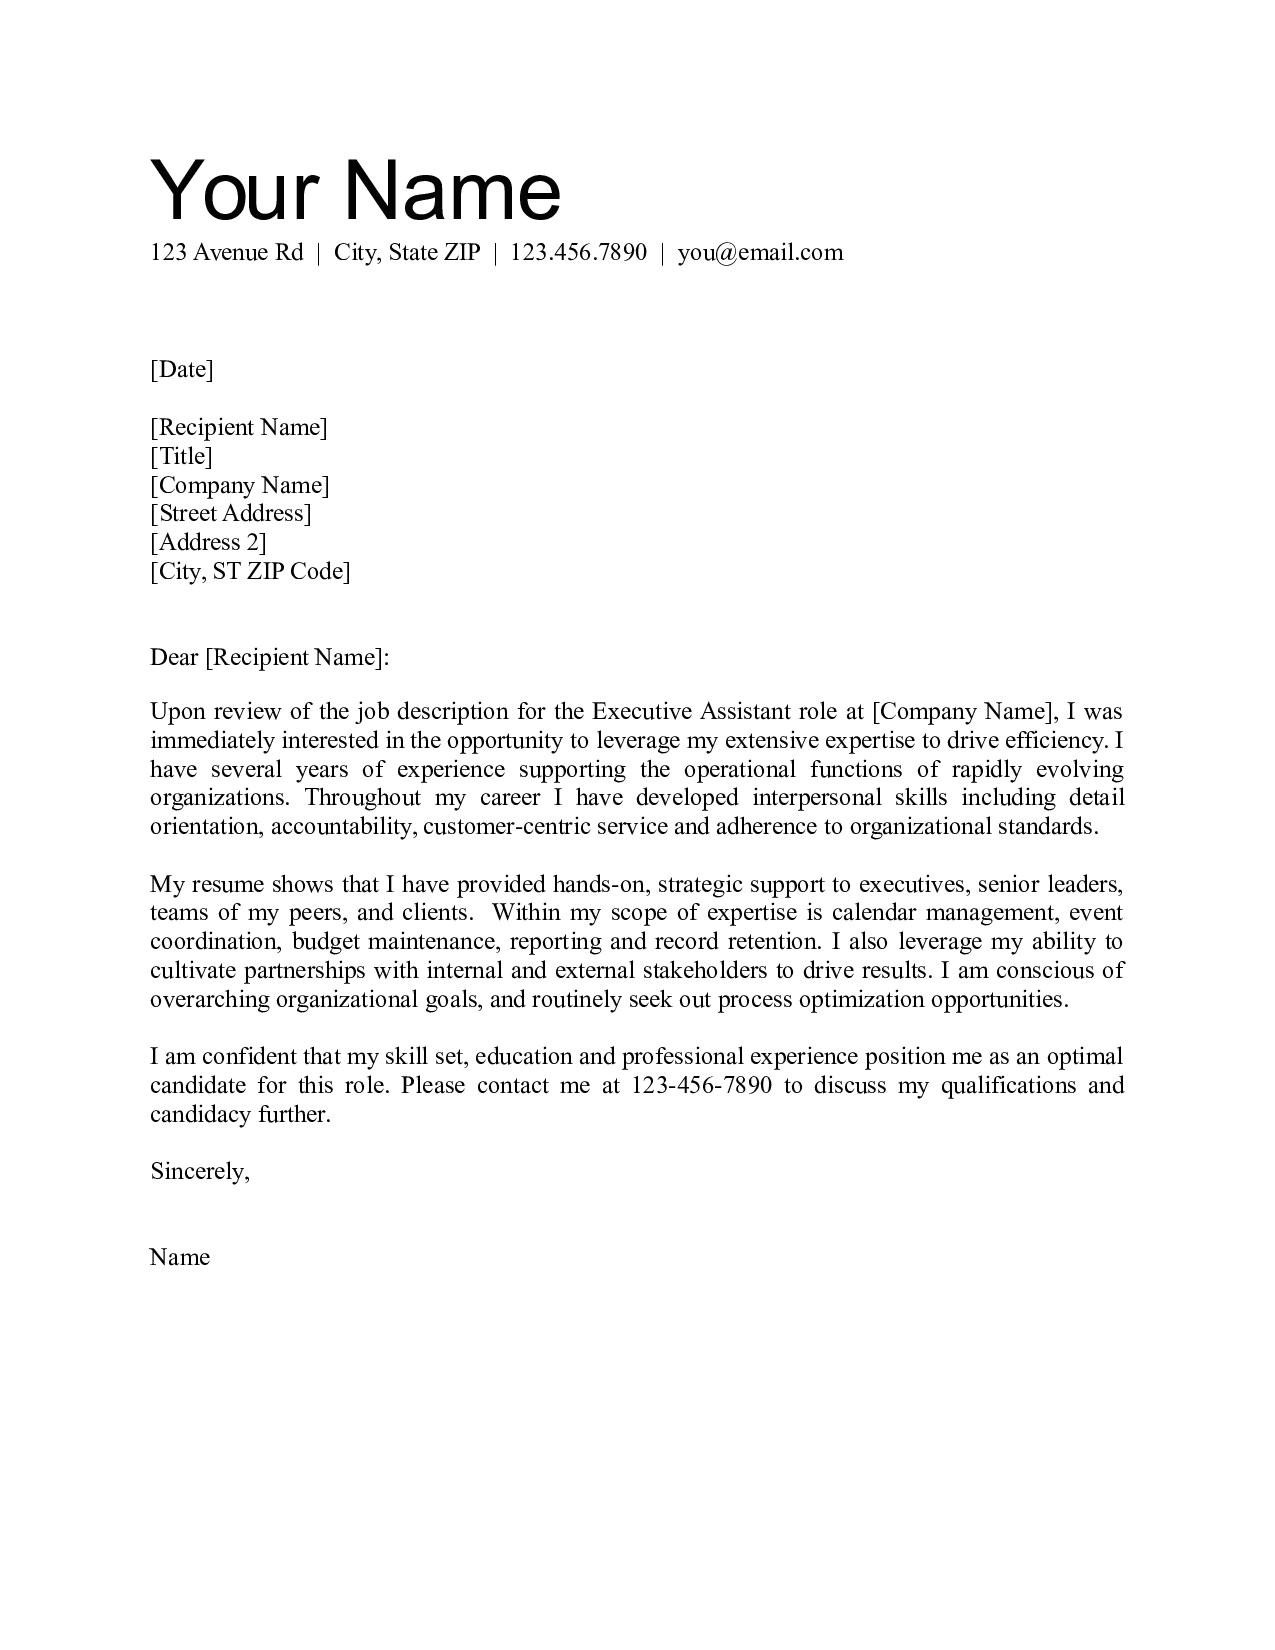 Cover Letter for Housing Officer Office assistant Cover Letter